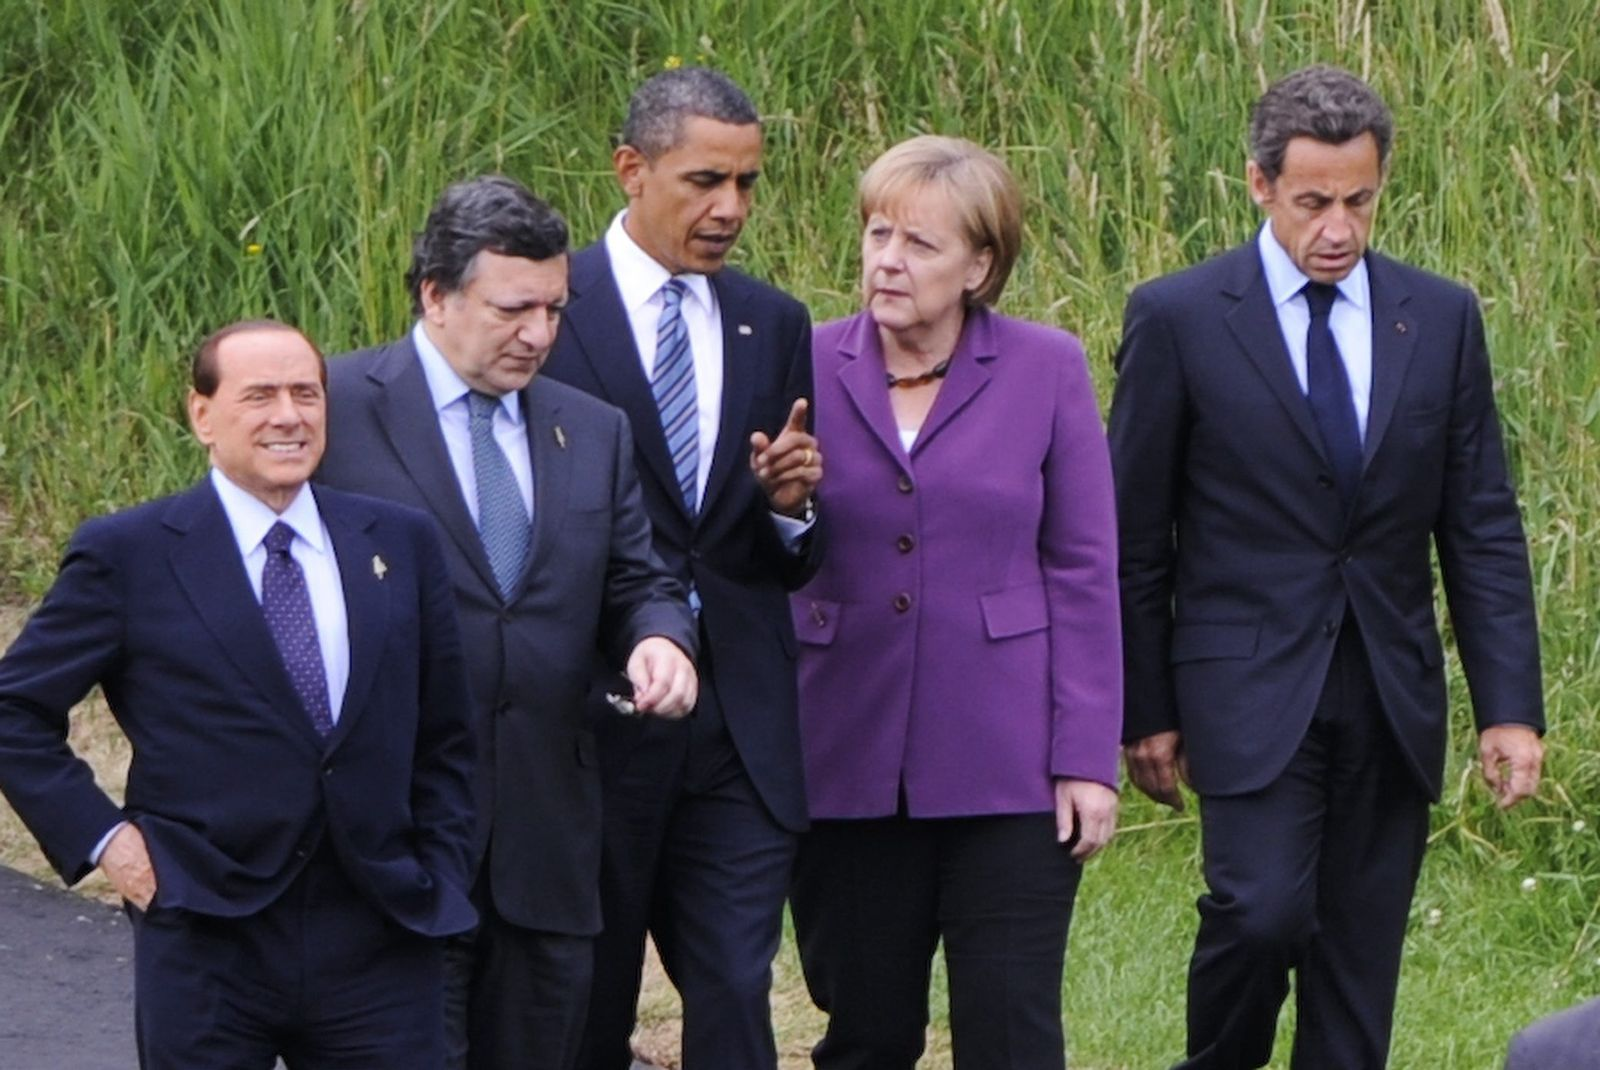 Merkel / Obama / Sarkozy / Barroso / Berlusconi